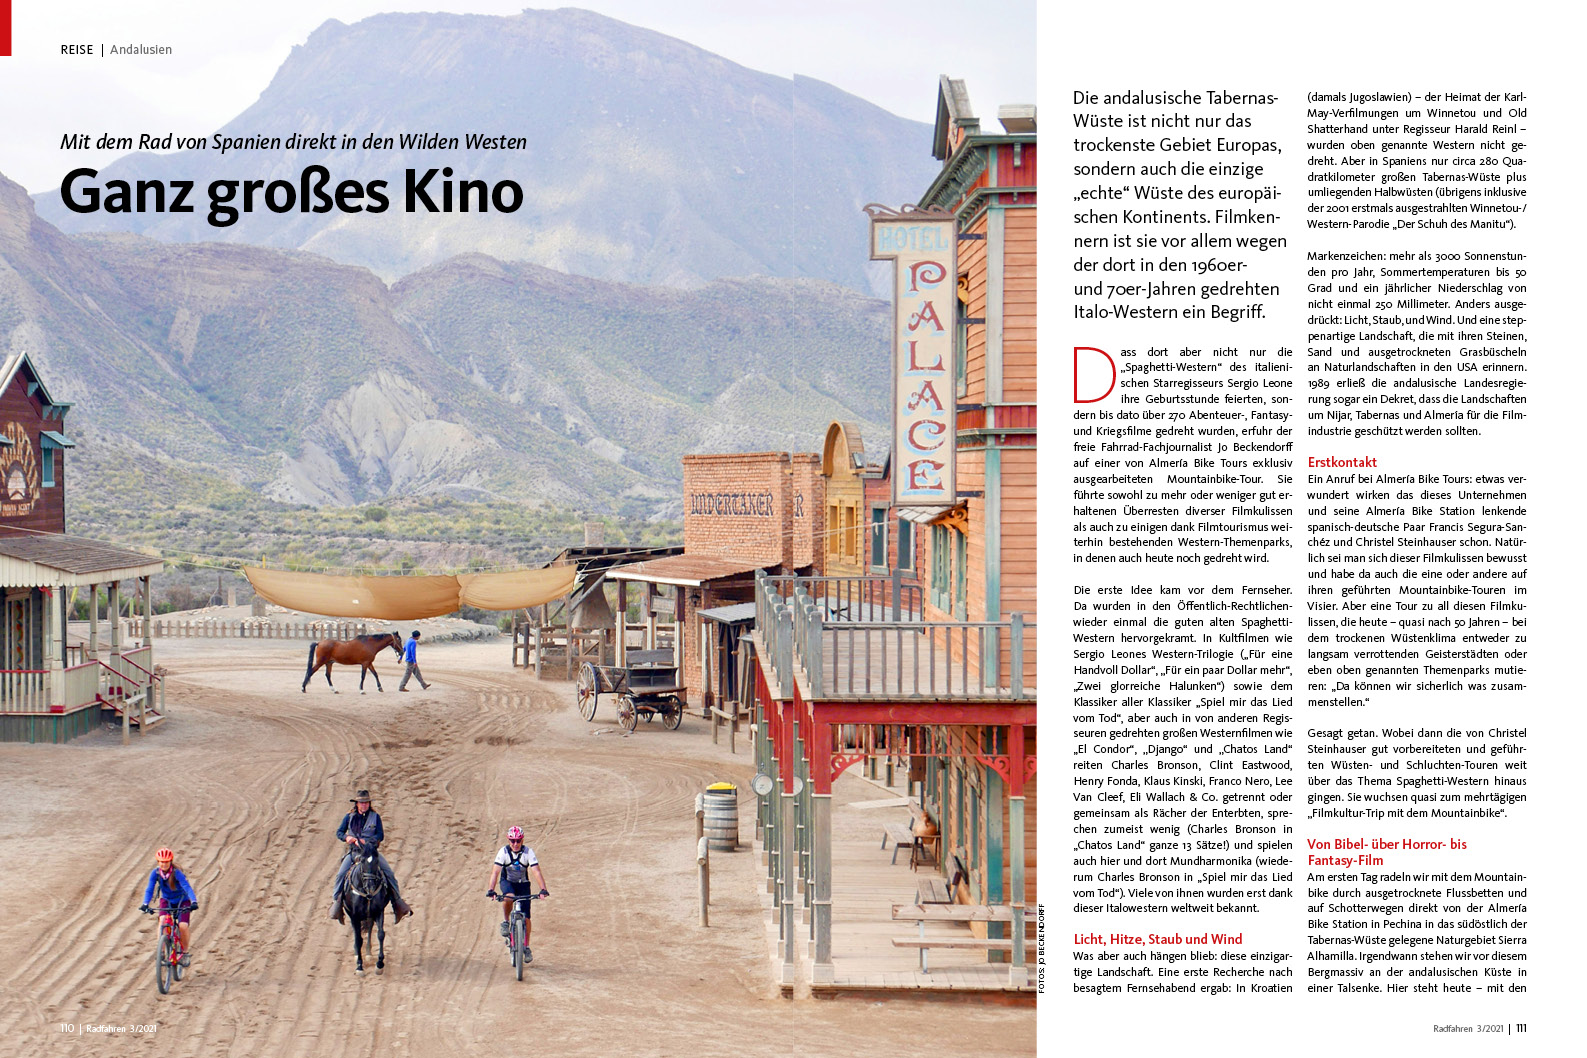 Biken statt Reiten in Andalusien